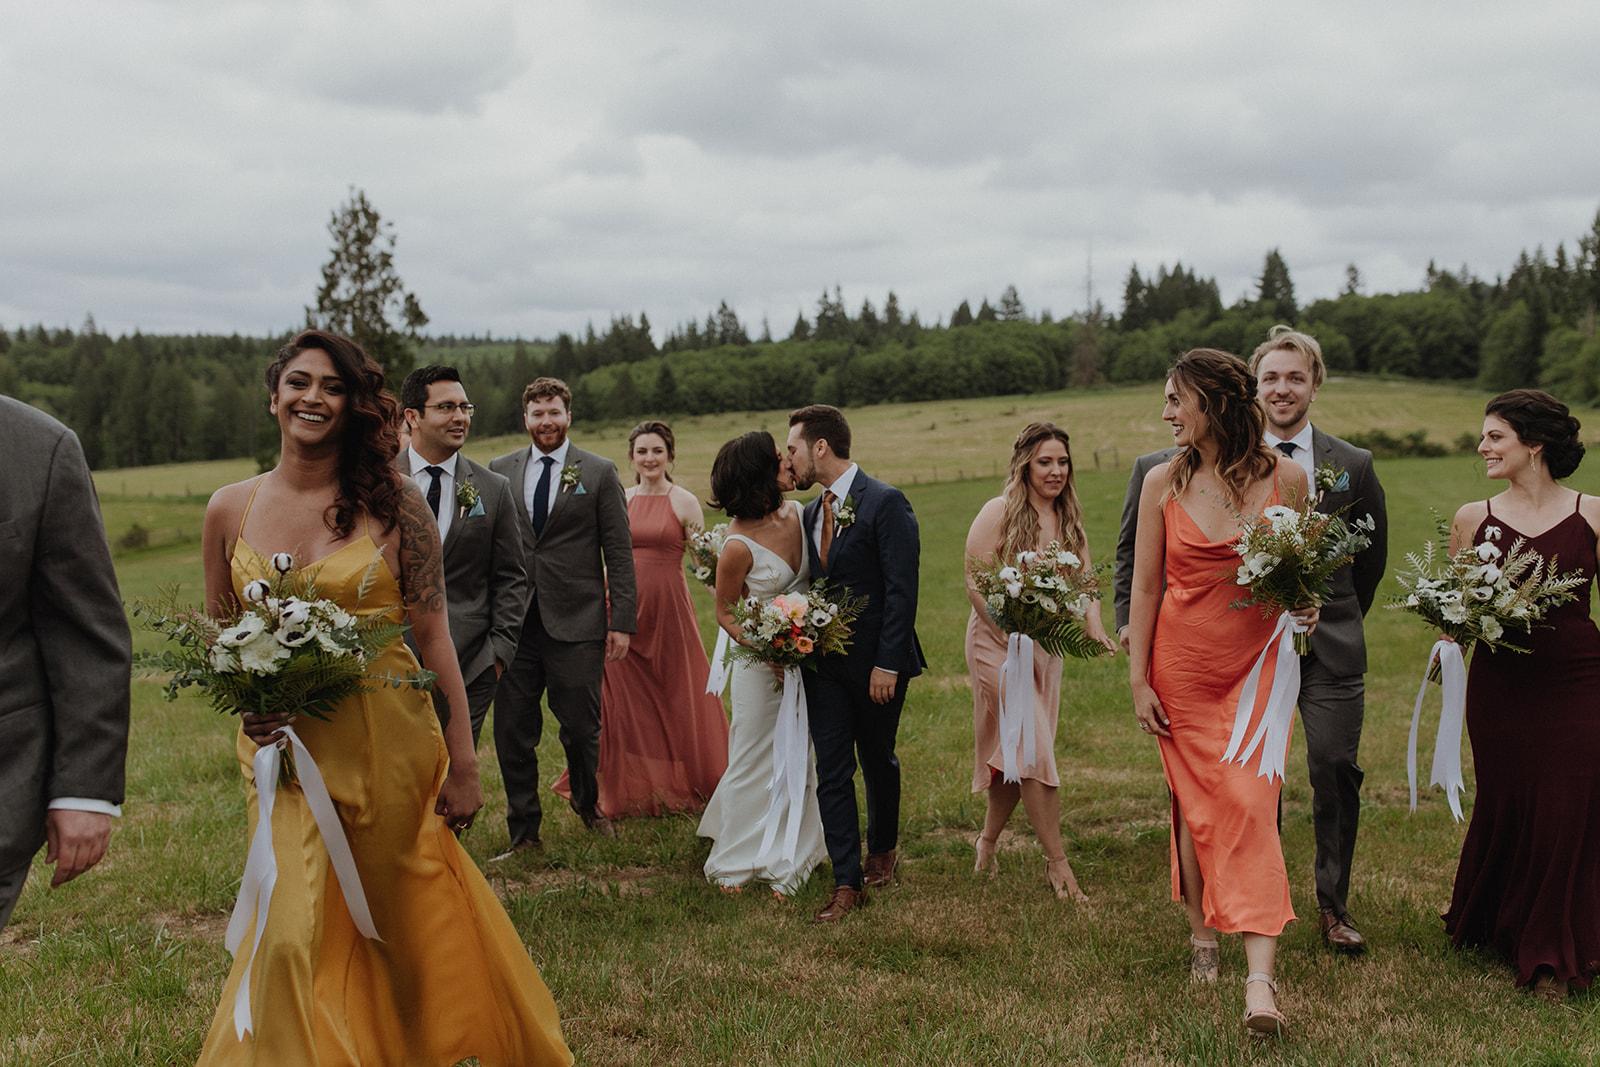 cortney_skye_wedding_june2019-198.jpg